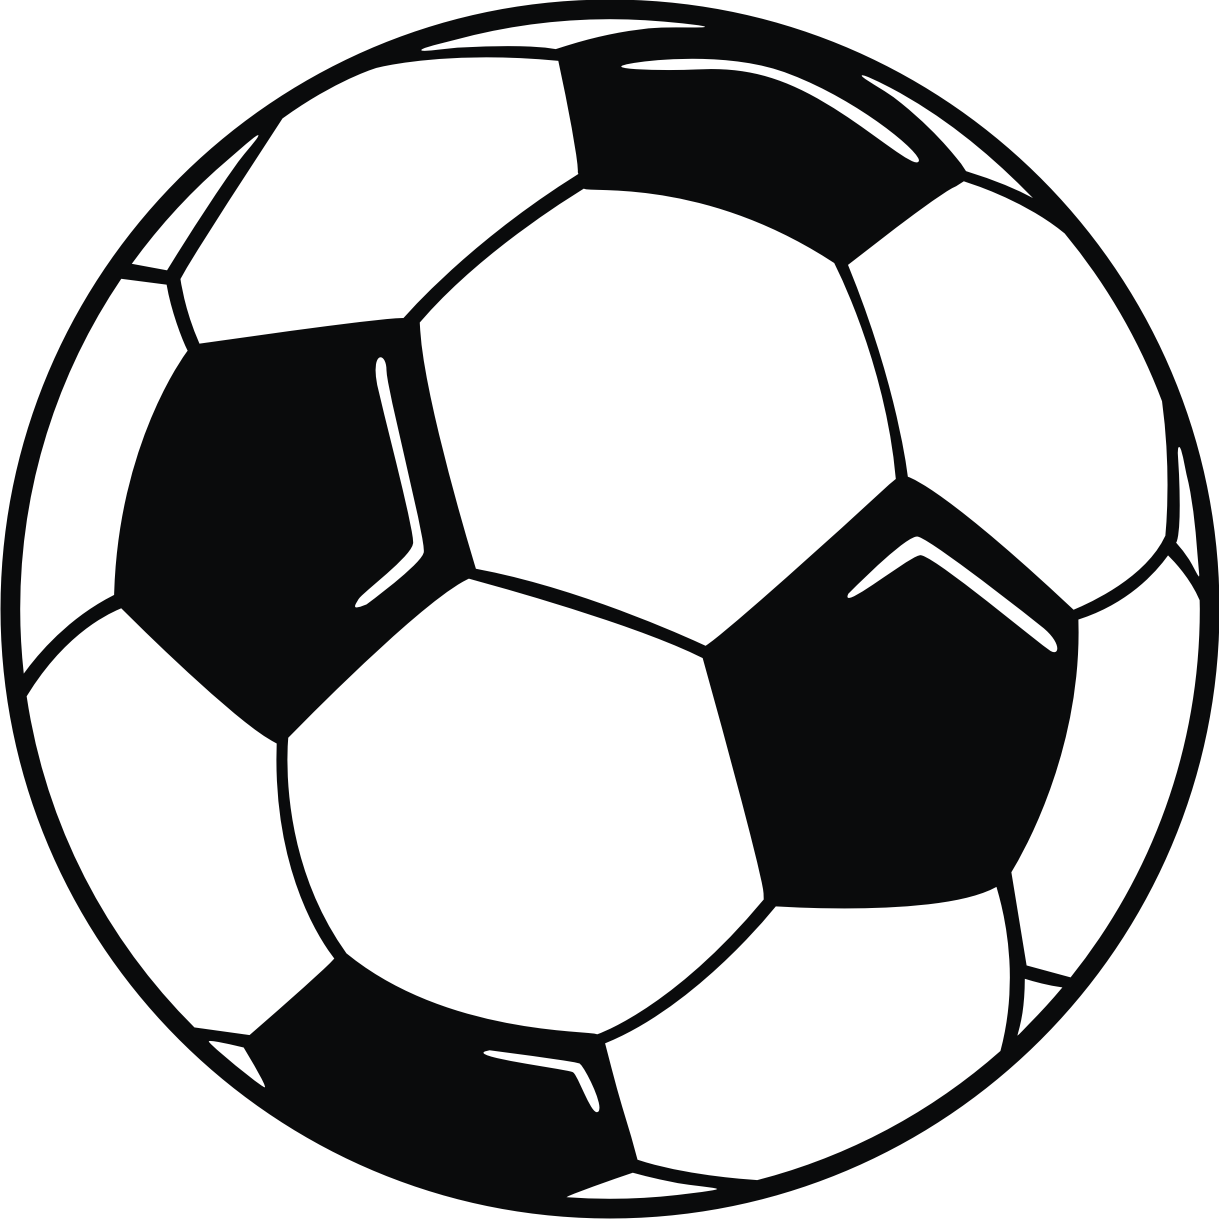 Clip art ball with. Award clipart soccer